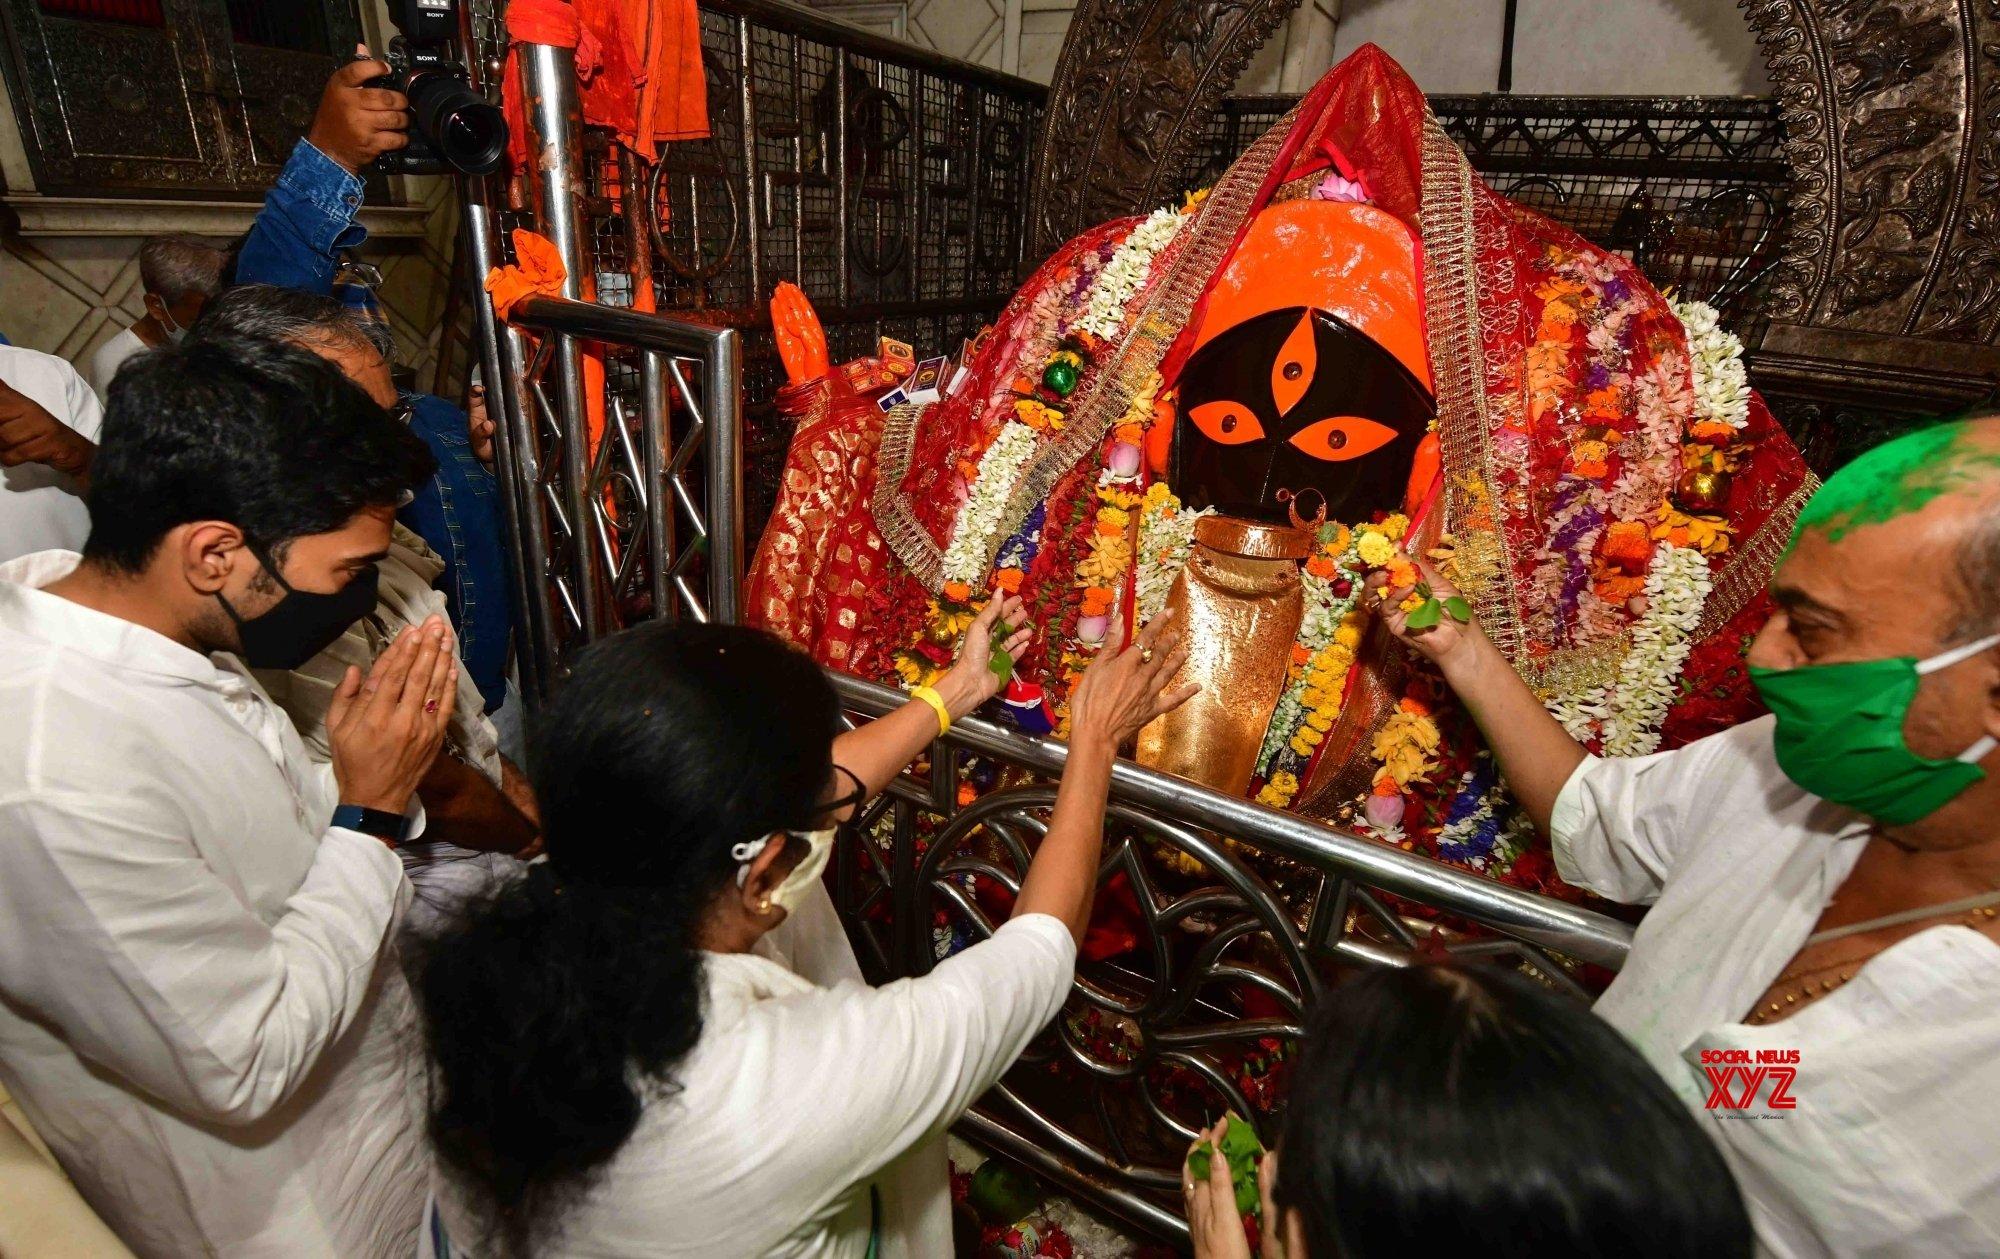 Kolkata : - West Bengal Chief Minister & TMC supremo Mamata Banerjee performed rituals at Kalighat Kali temple #Gallery